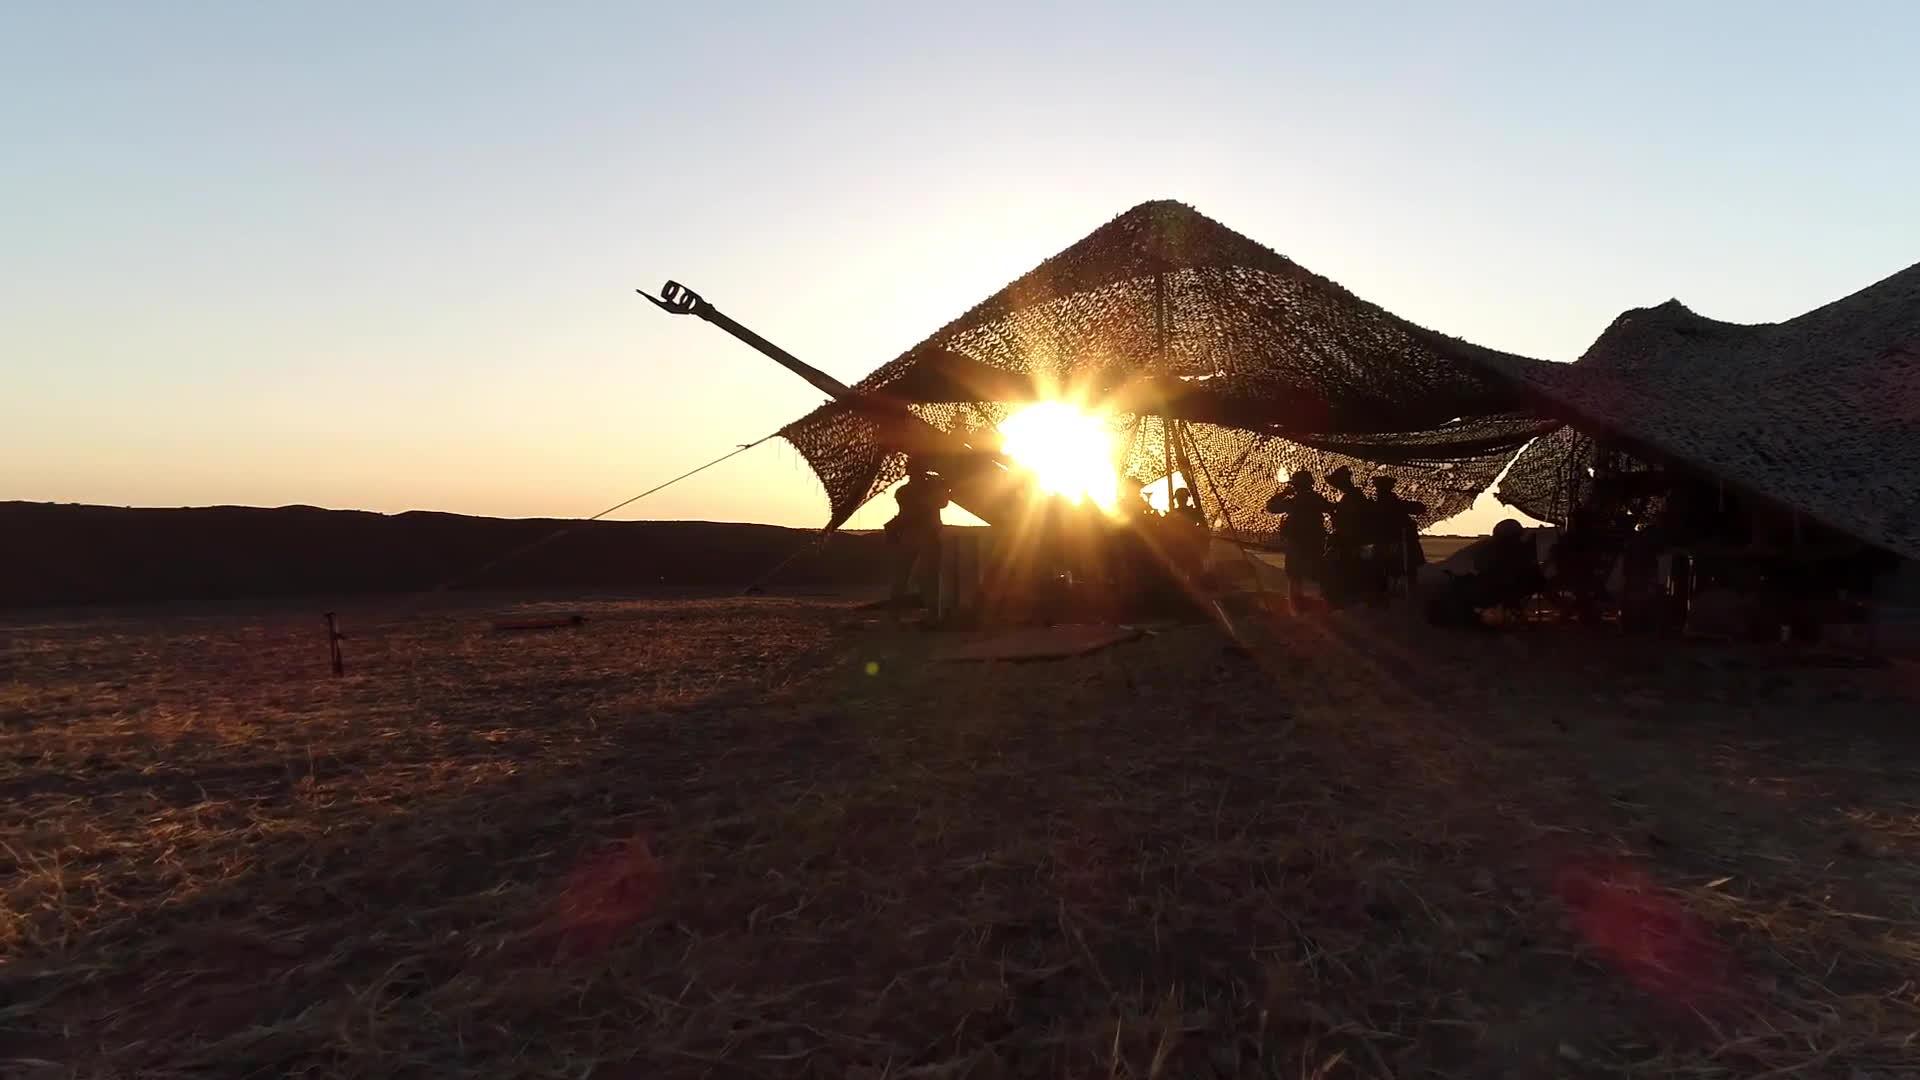 marine corps, marines, usmc, Artillery Marines Rain Steel on ISIS in Syria GIFs